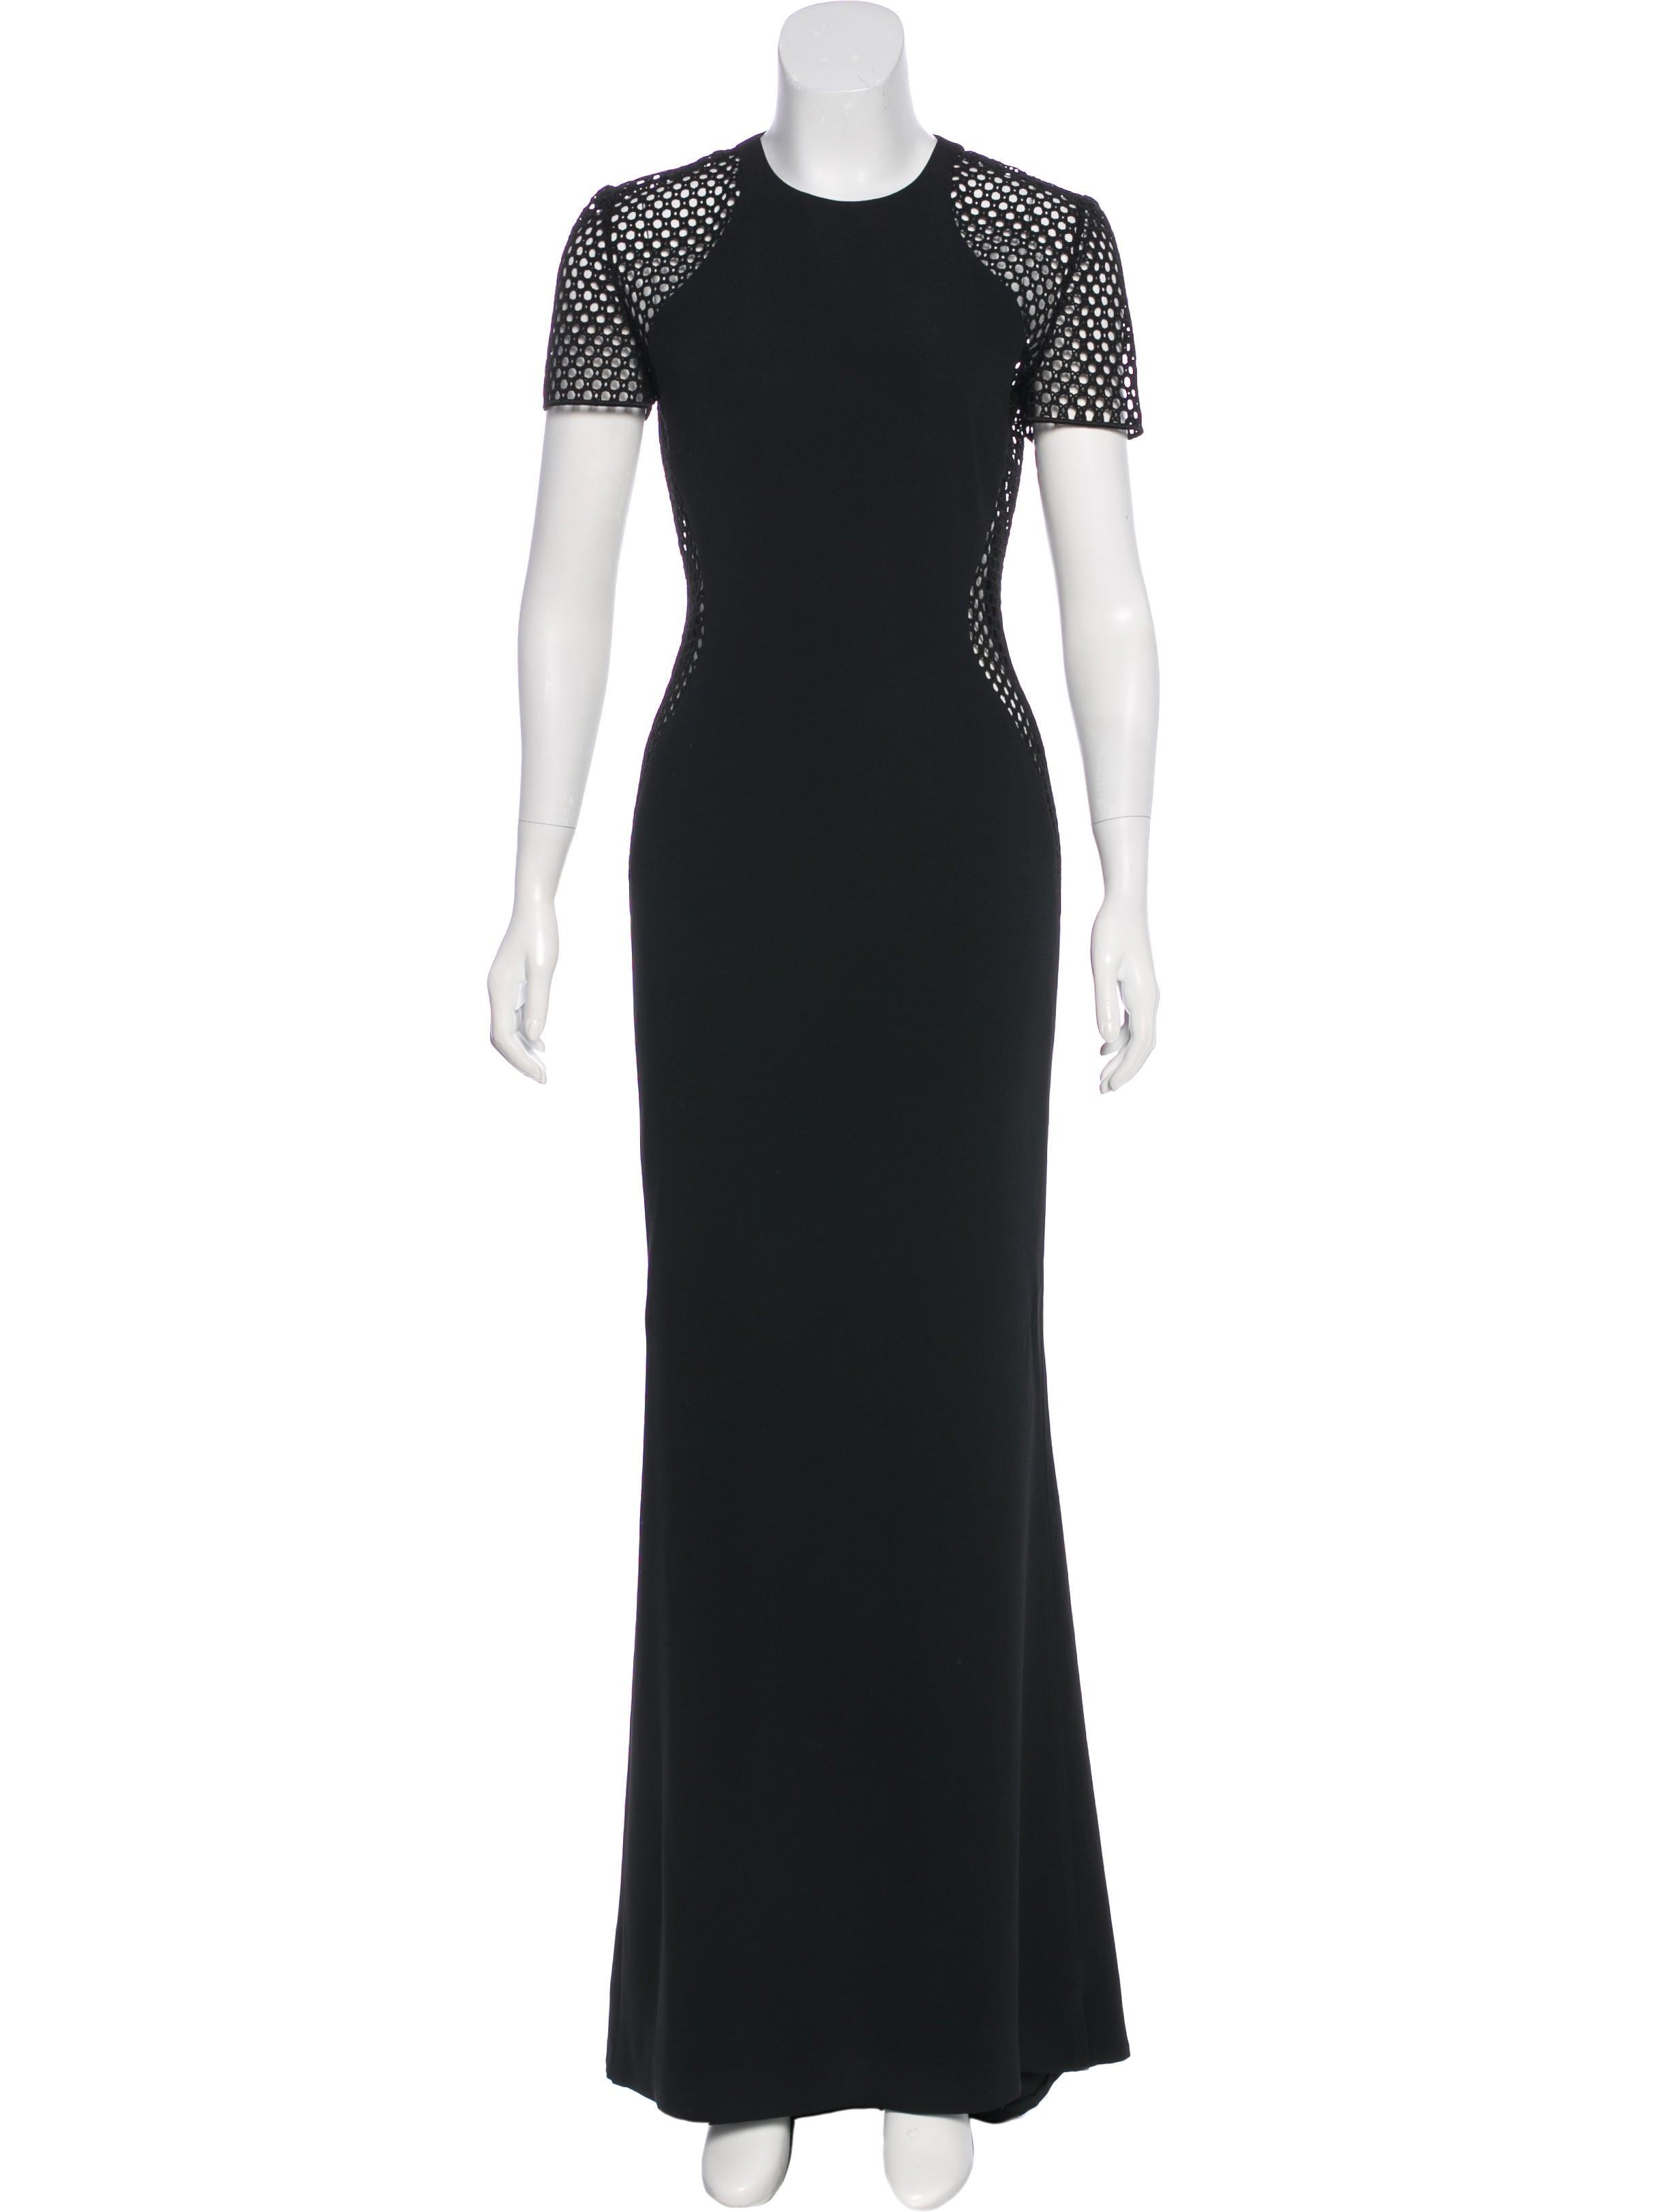 Stella McCartney Eyelet Evening Dress - Clothing - STL61753 | The ...